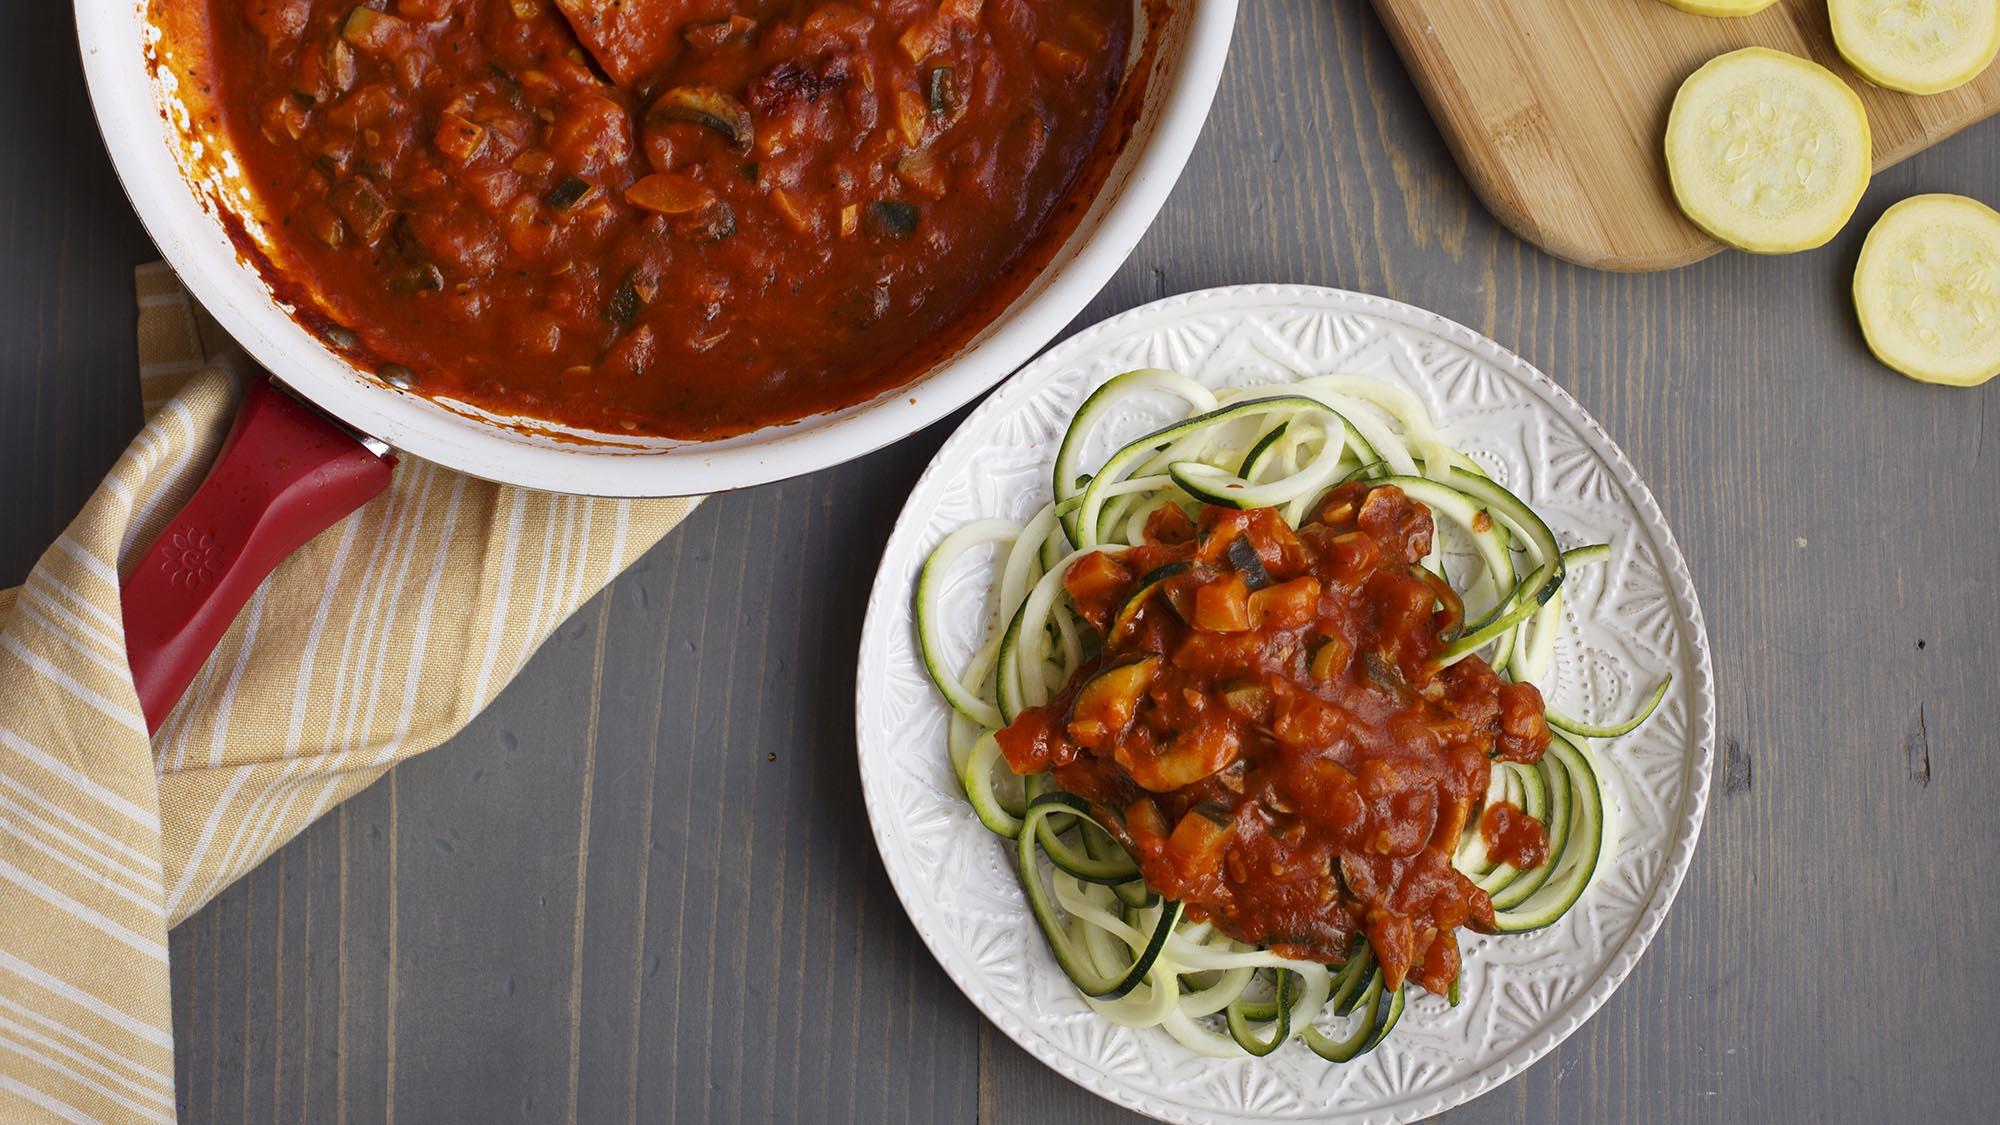 McCormick Gluten Free Vegetable Spaghetti Sauce